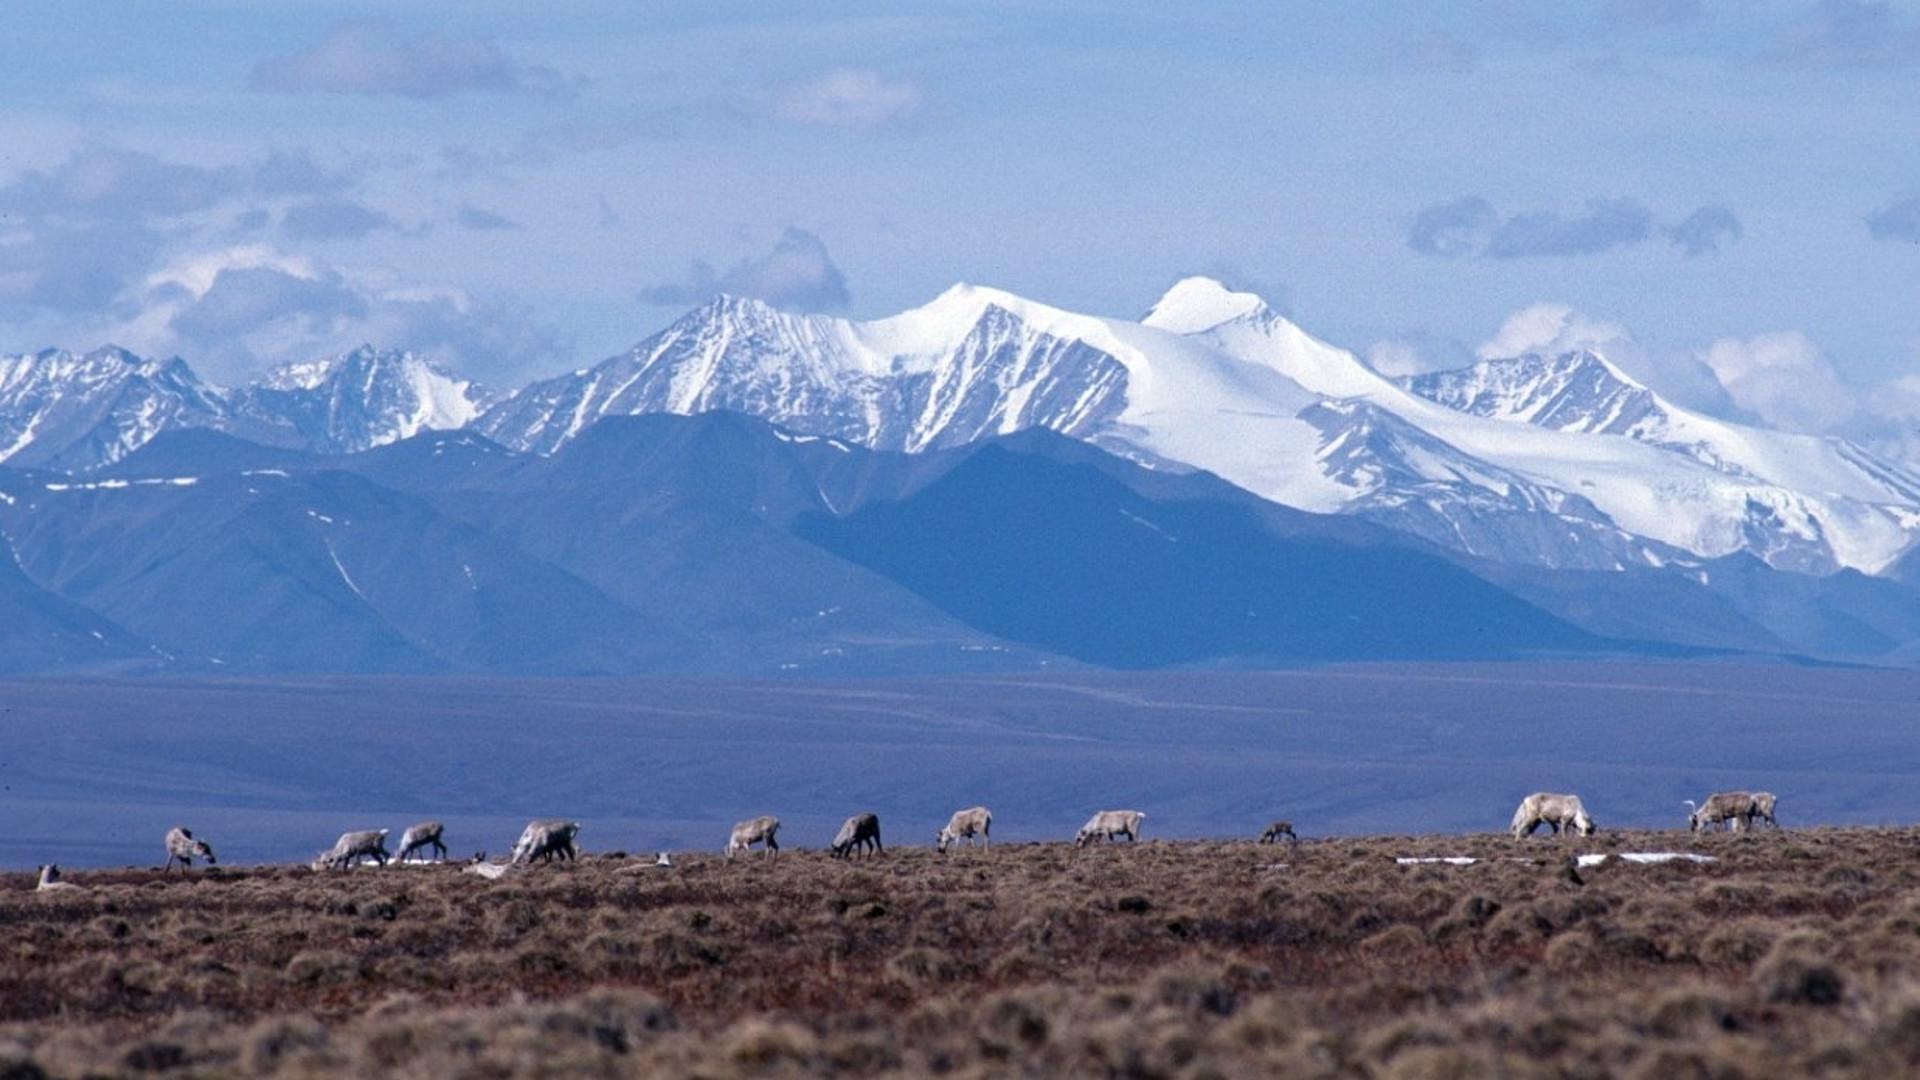 caribou anwr artcic wildlife refuge